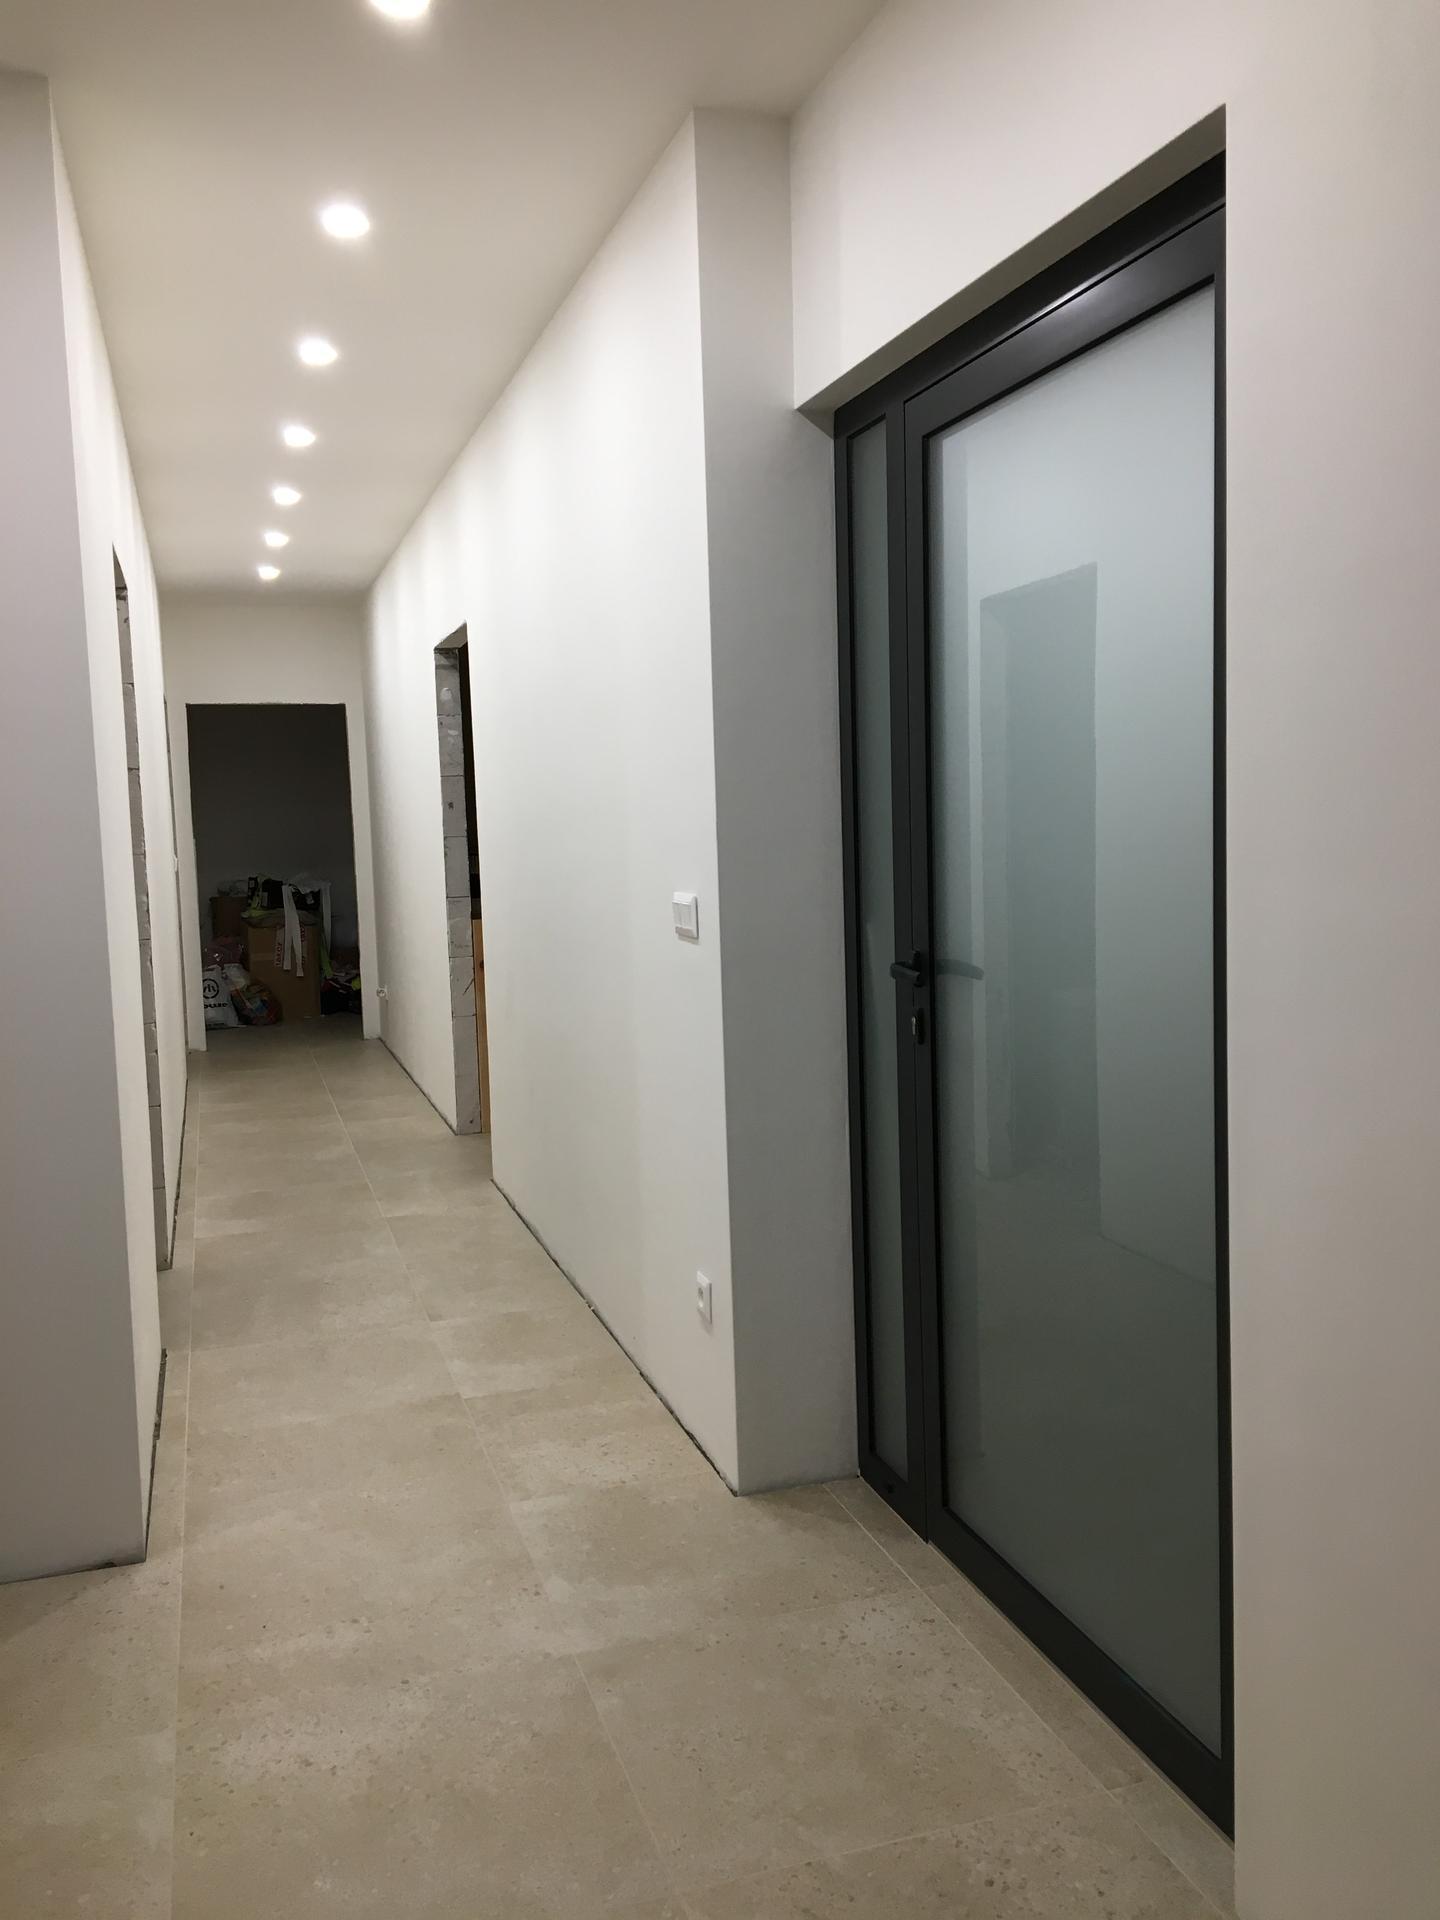 Tvorime domov - dvere budu snad v january